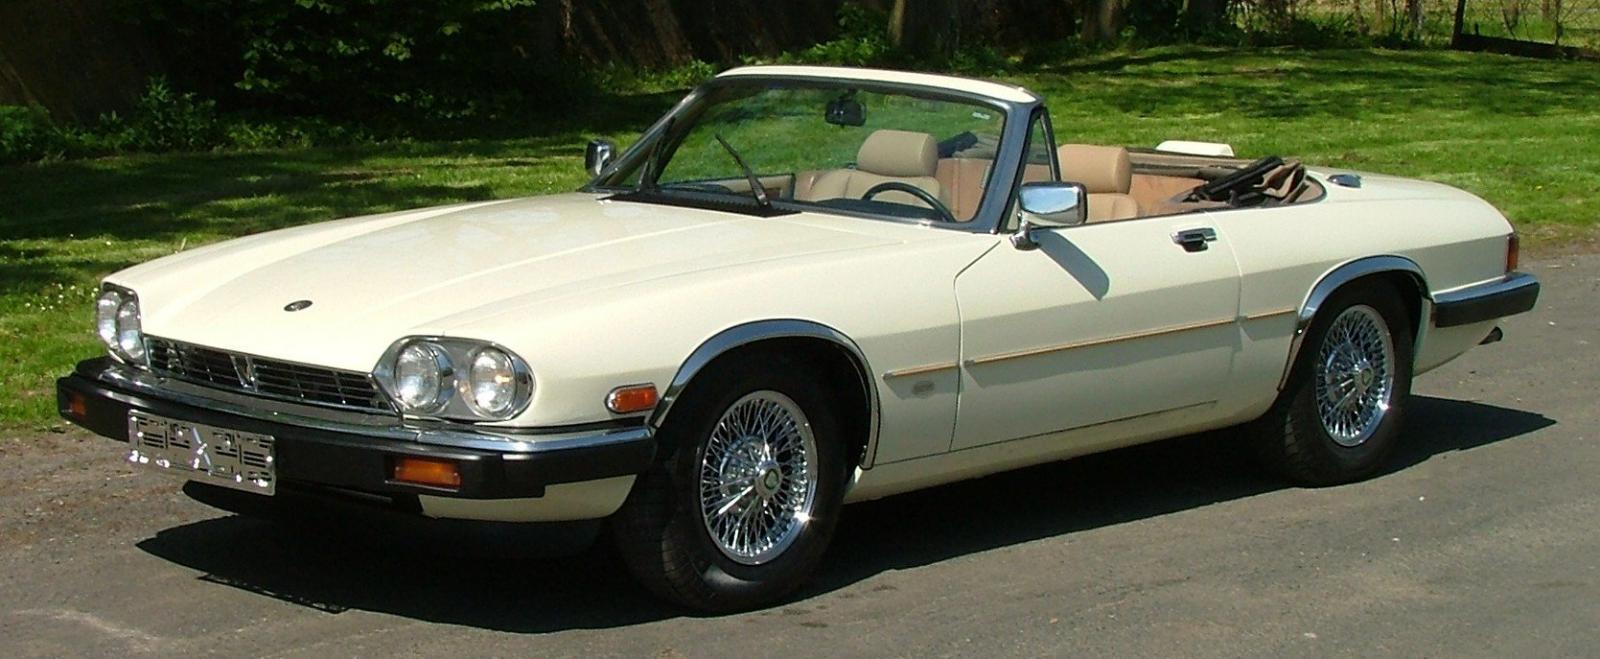 1983 jaguar xjs xj sc 5 3 326 cui v12 gasoline 217 kw 432 nm. Black Bedroom Furniture Sets. Home Design Ideas